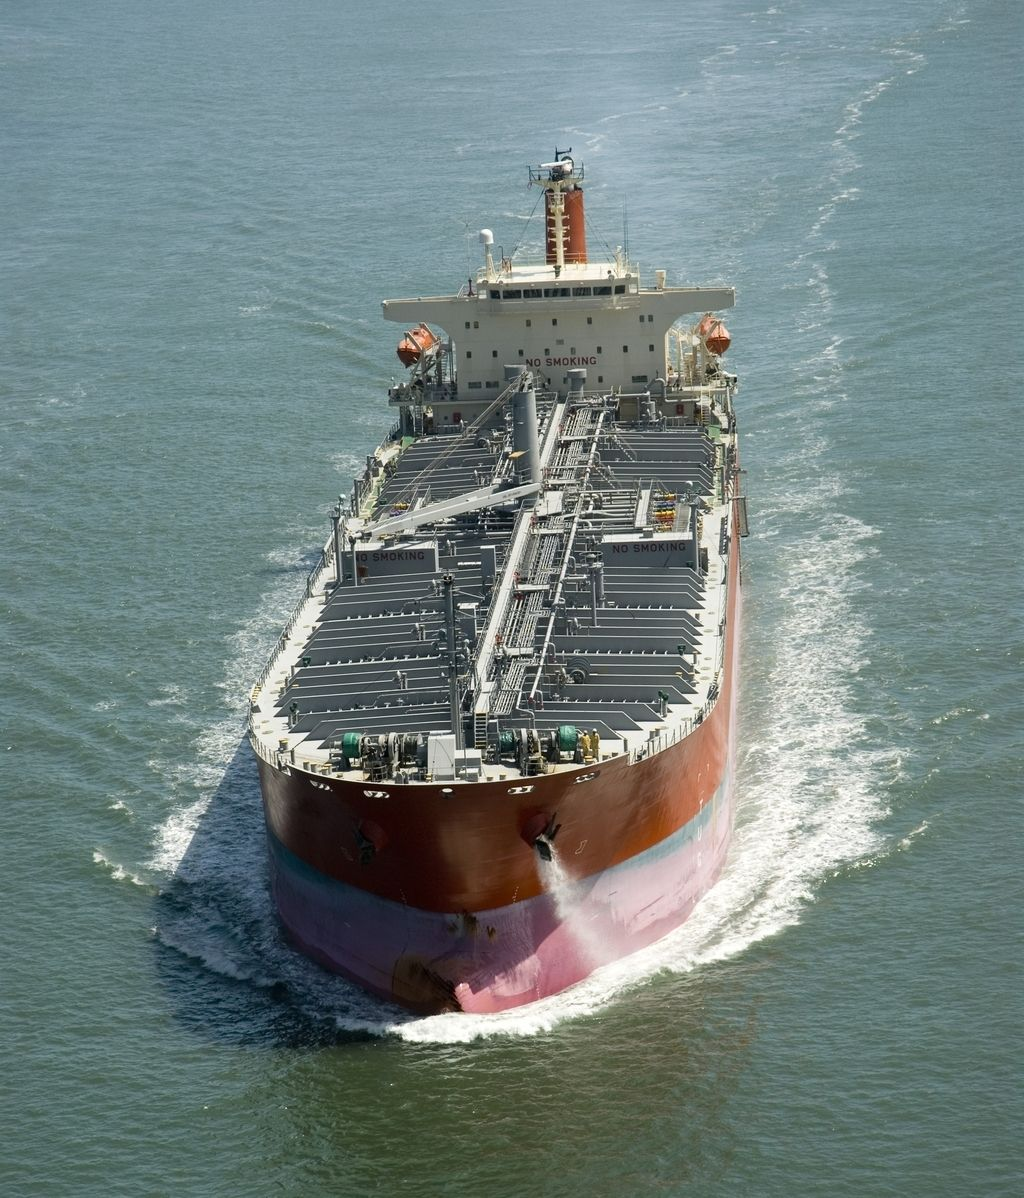 Un petrolero, en aguas del golfo de Guinea